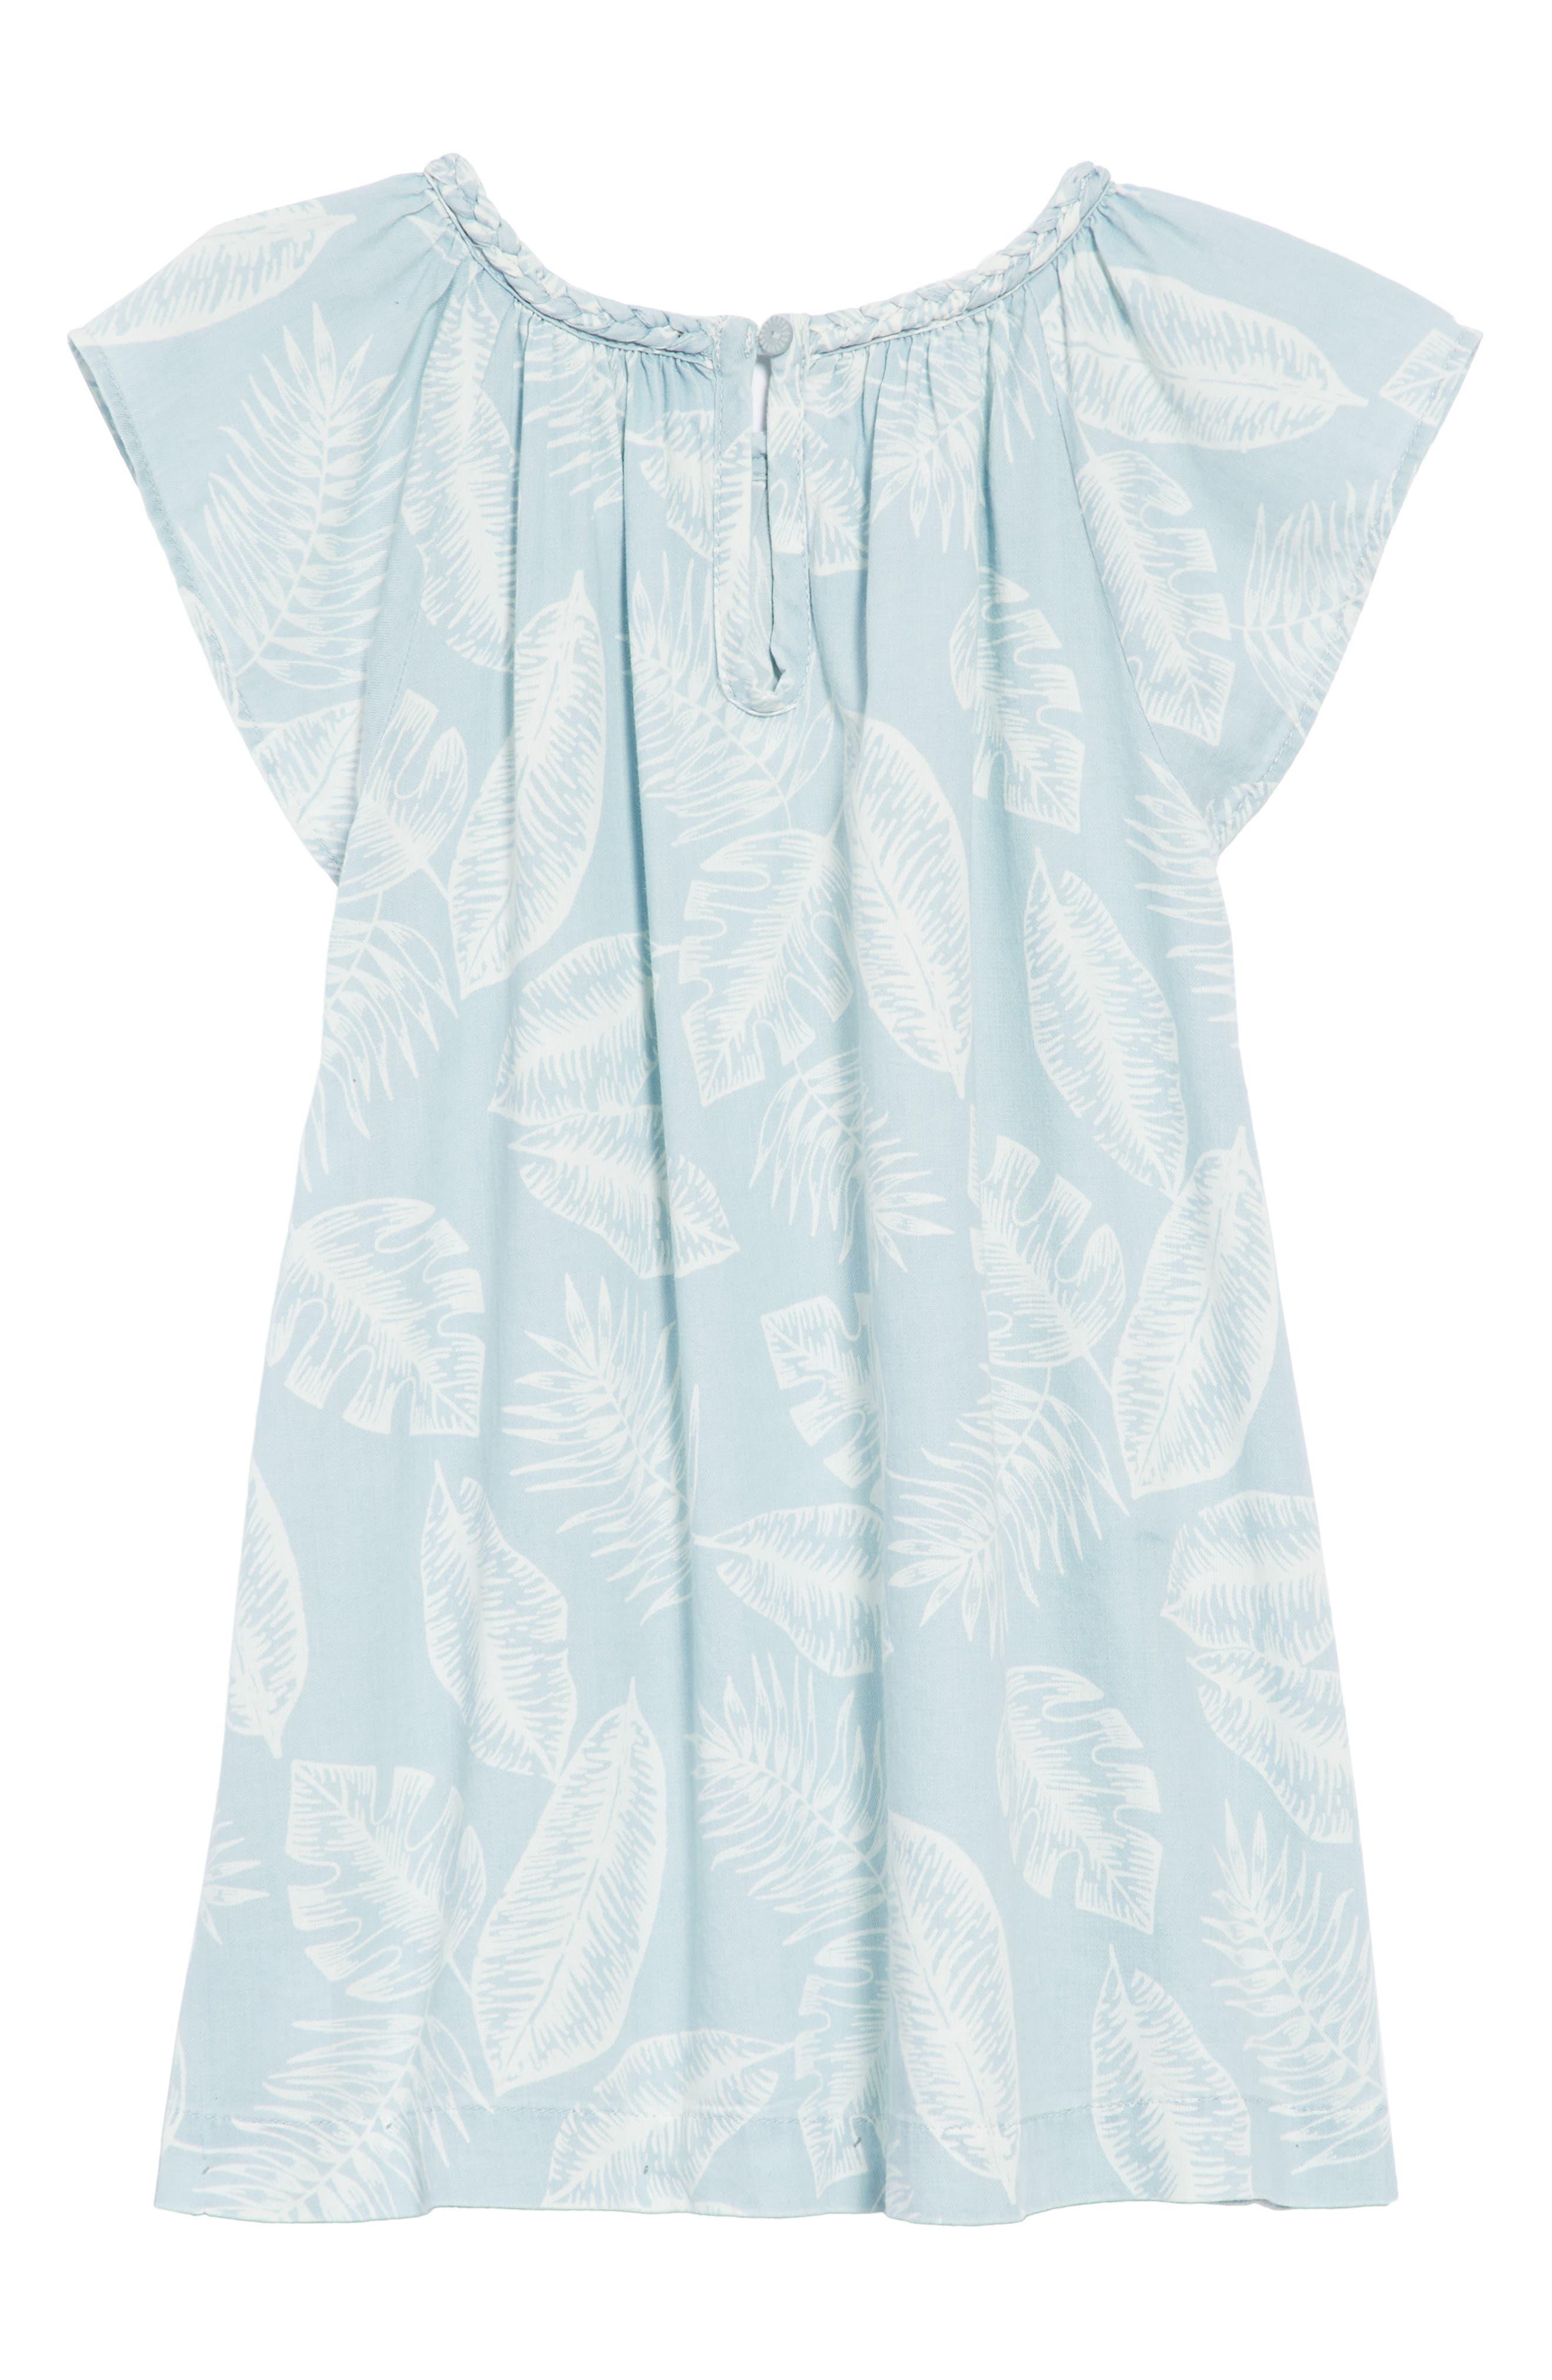 Palm Leaf Chambray Dress,                             Alternate thumbnail 2, color,                             420